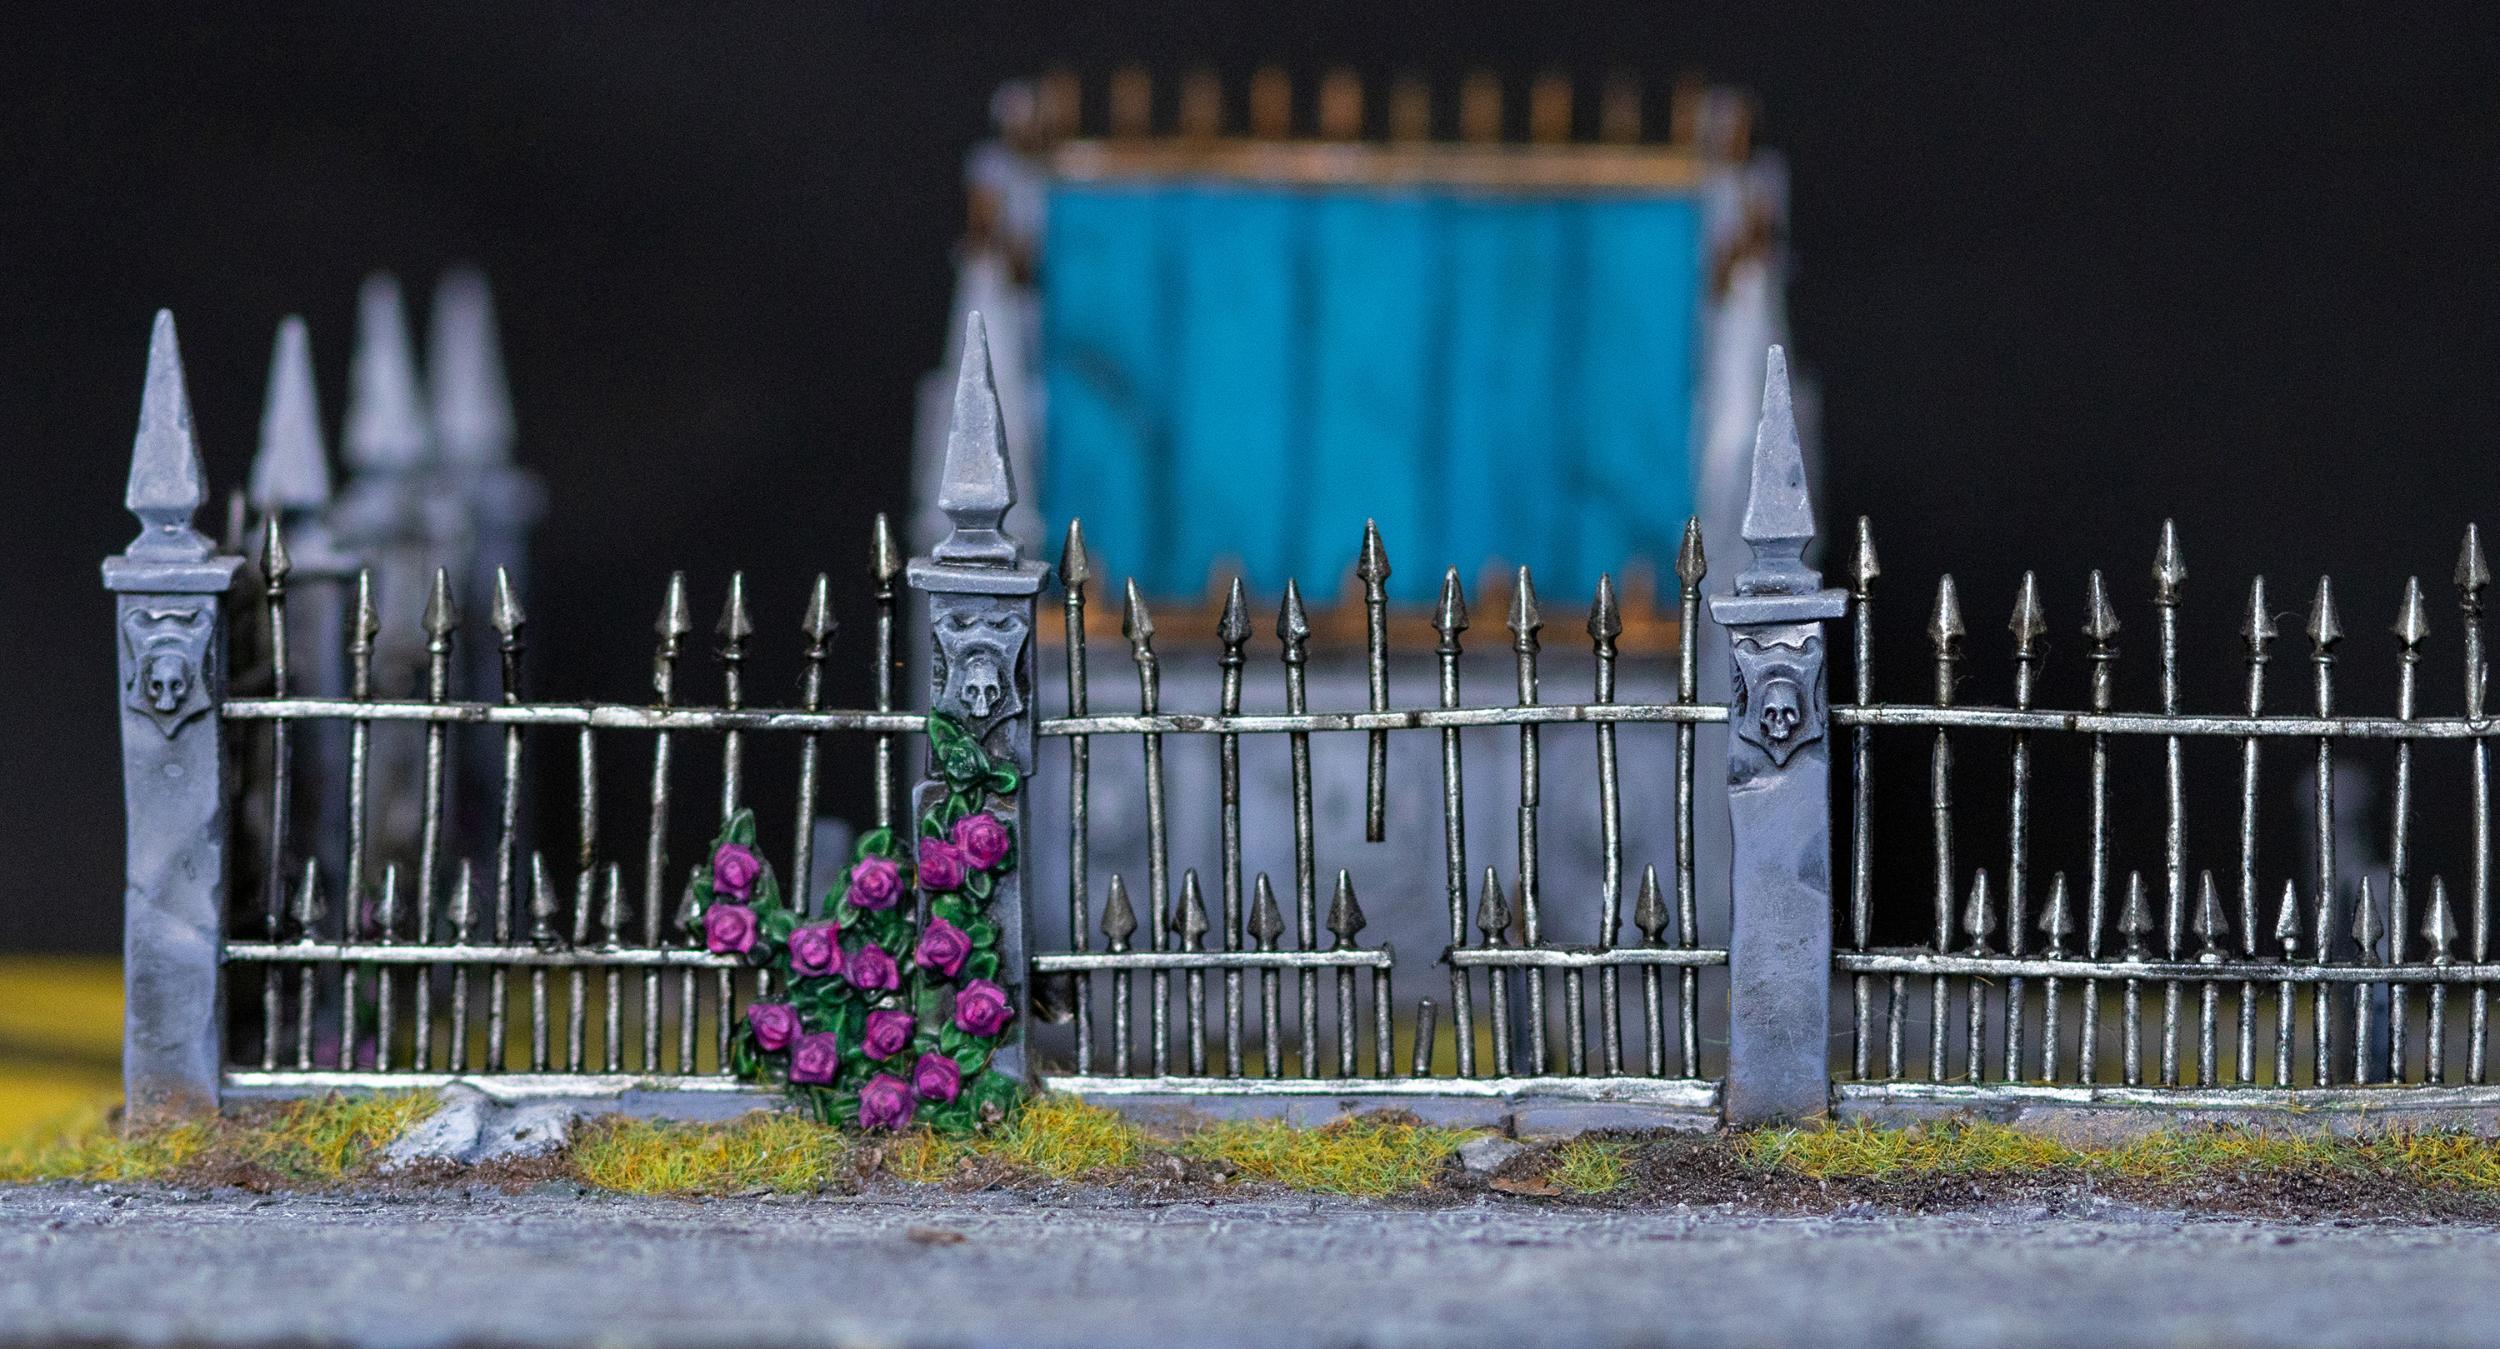 Friedhof_2020_3_s.jpg.b6c4ae81a339b63a8354cd05bdc33d4e.jpg